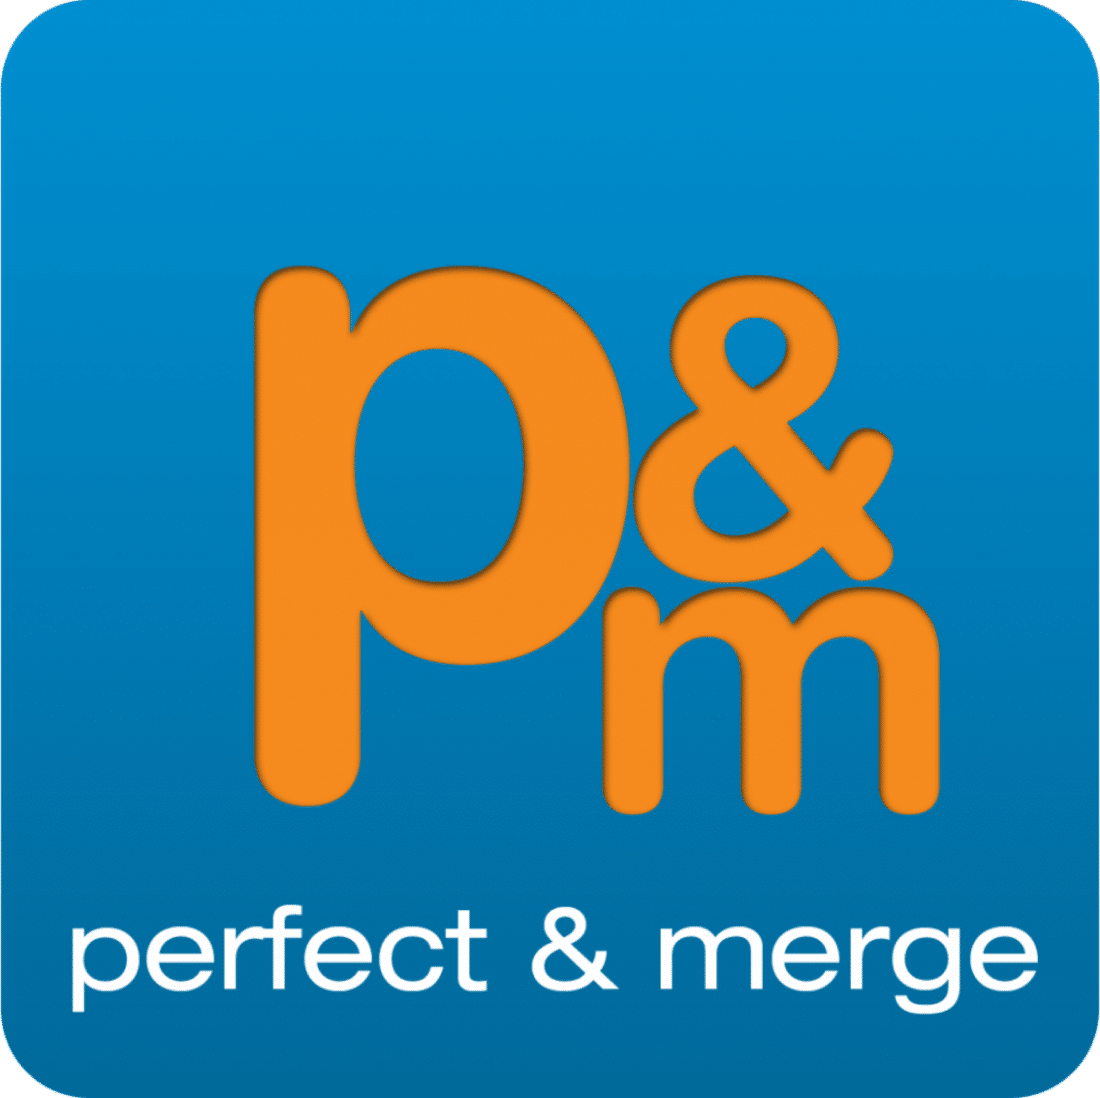 perfectmerge logo 1024x1022